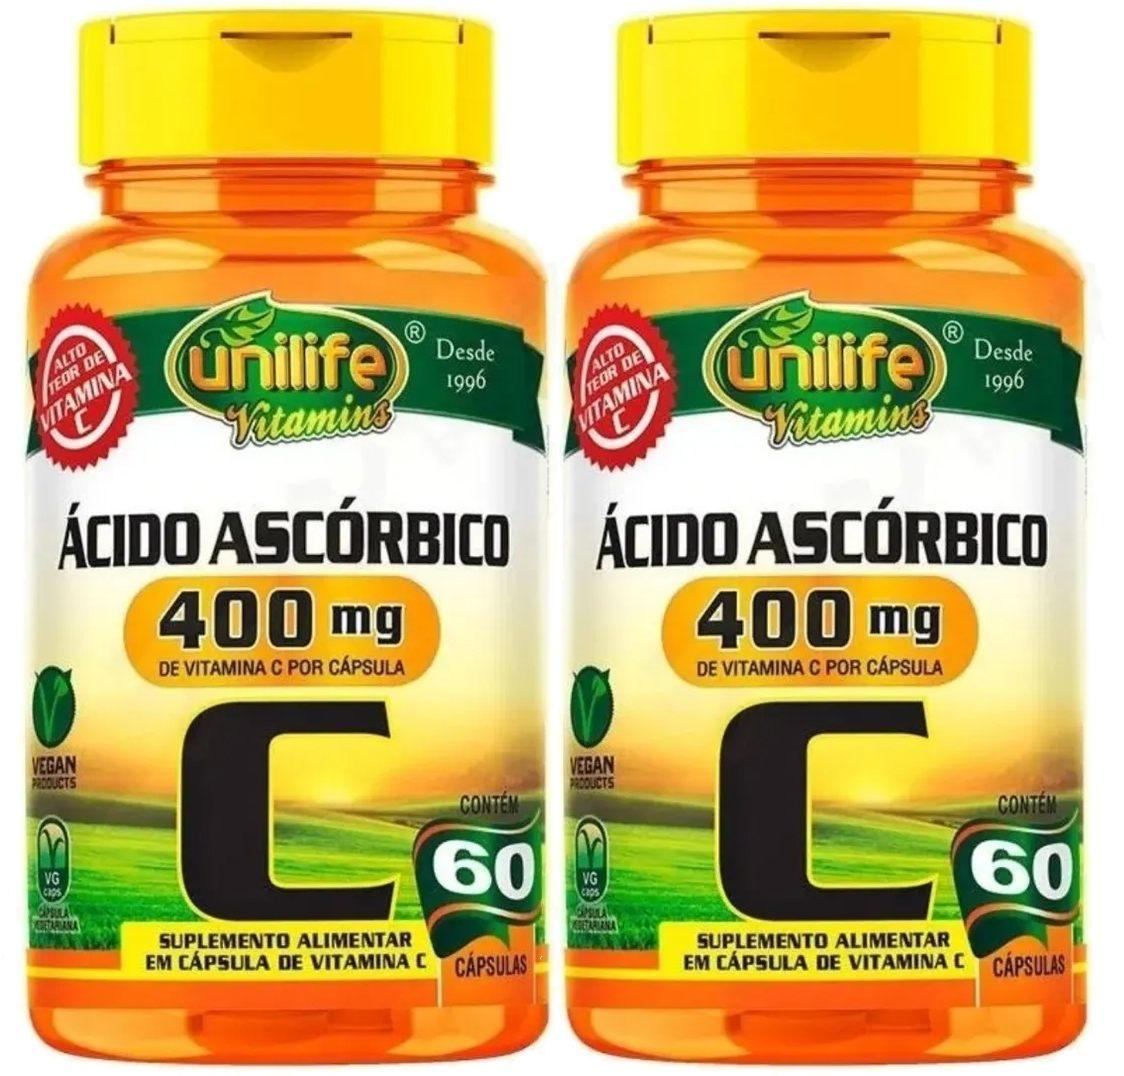 Kit C/ 2 Un. Vitamina C Pura Ácido Ascórbico 750mg 120 Caps